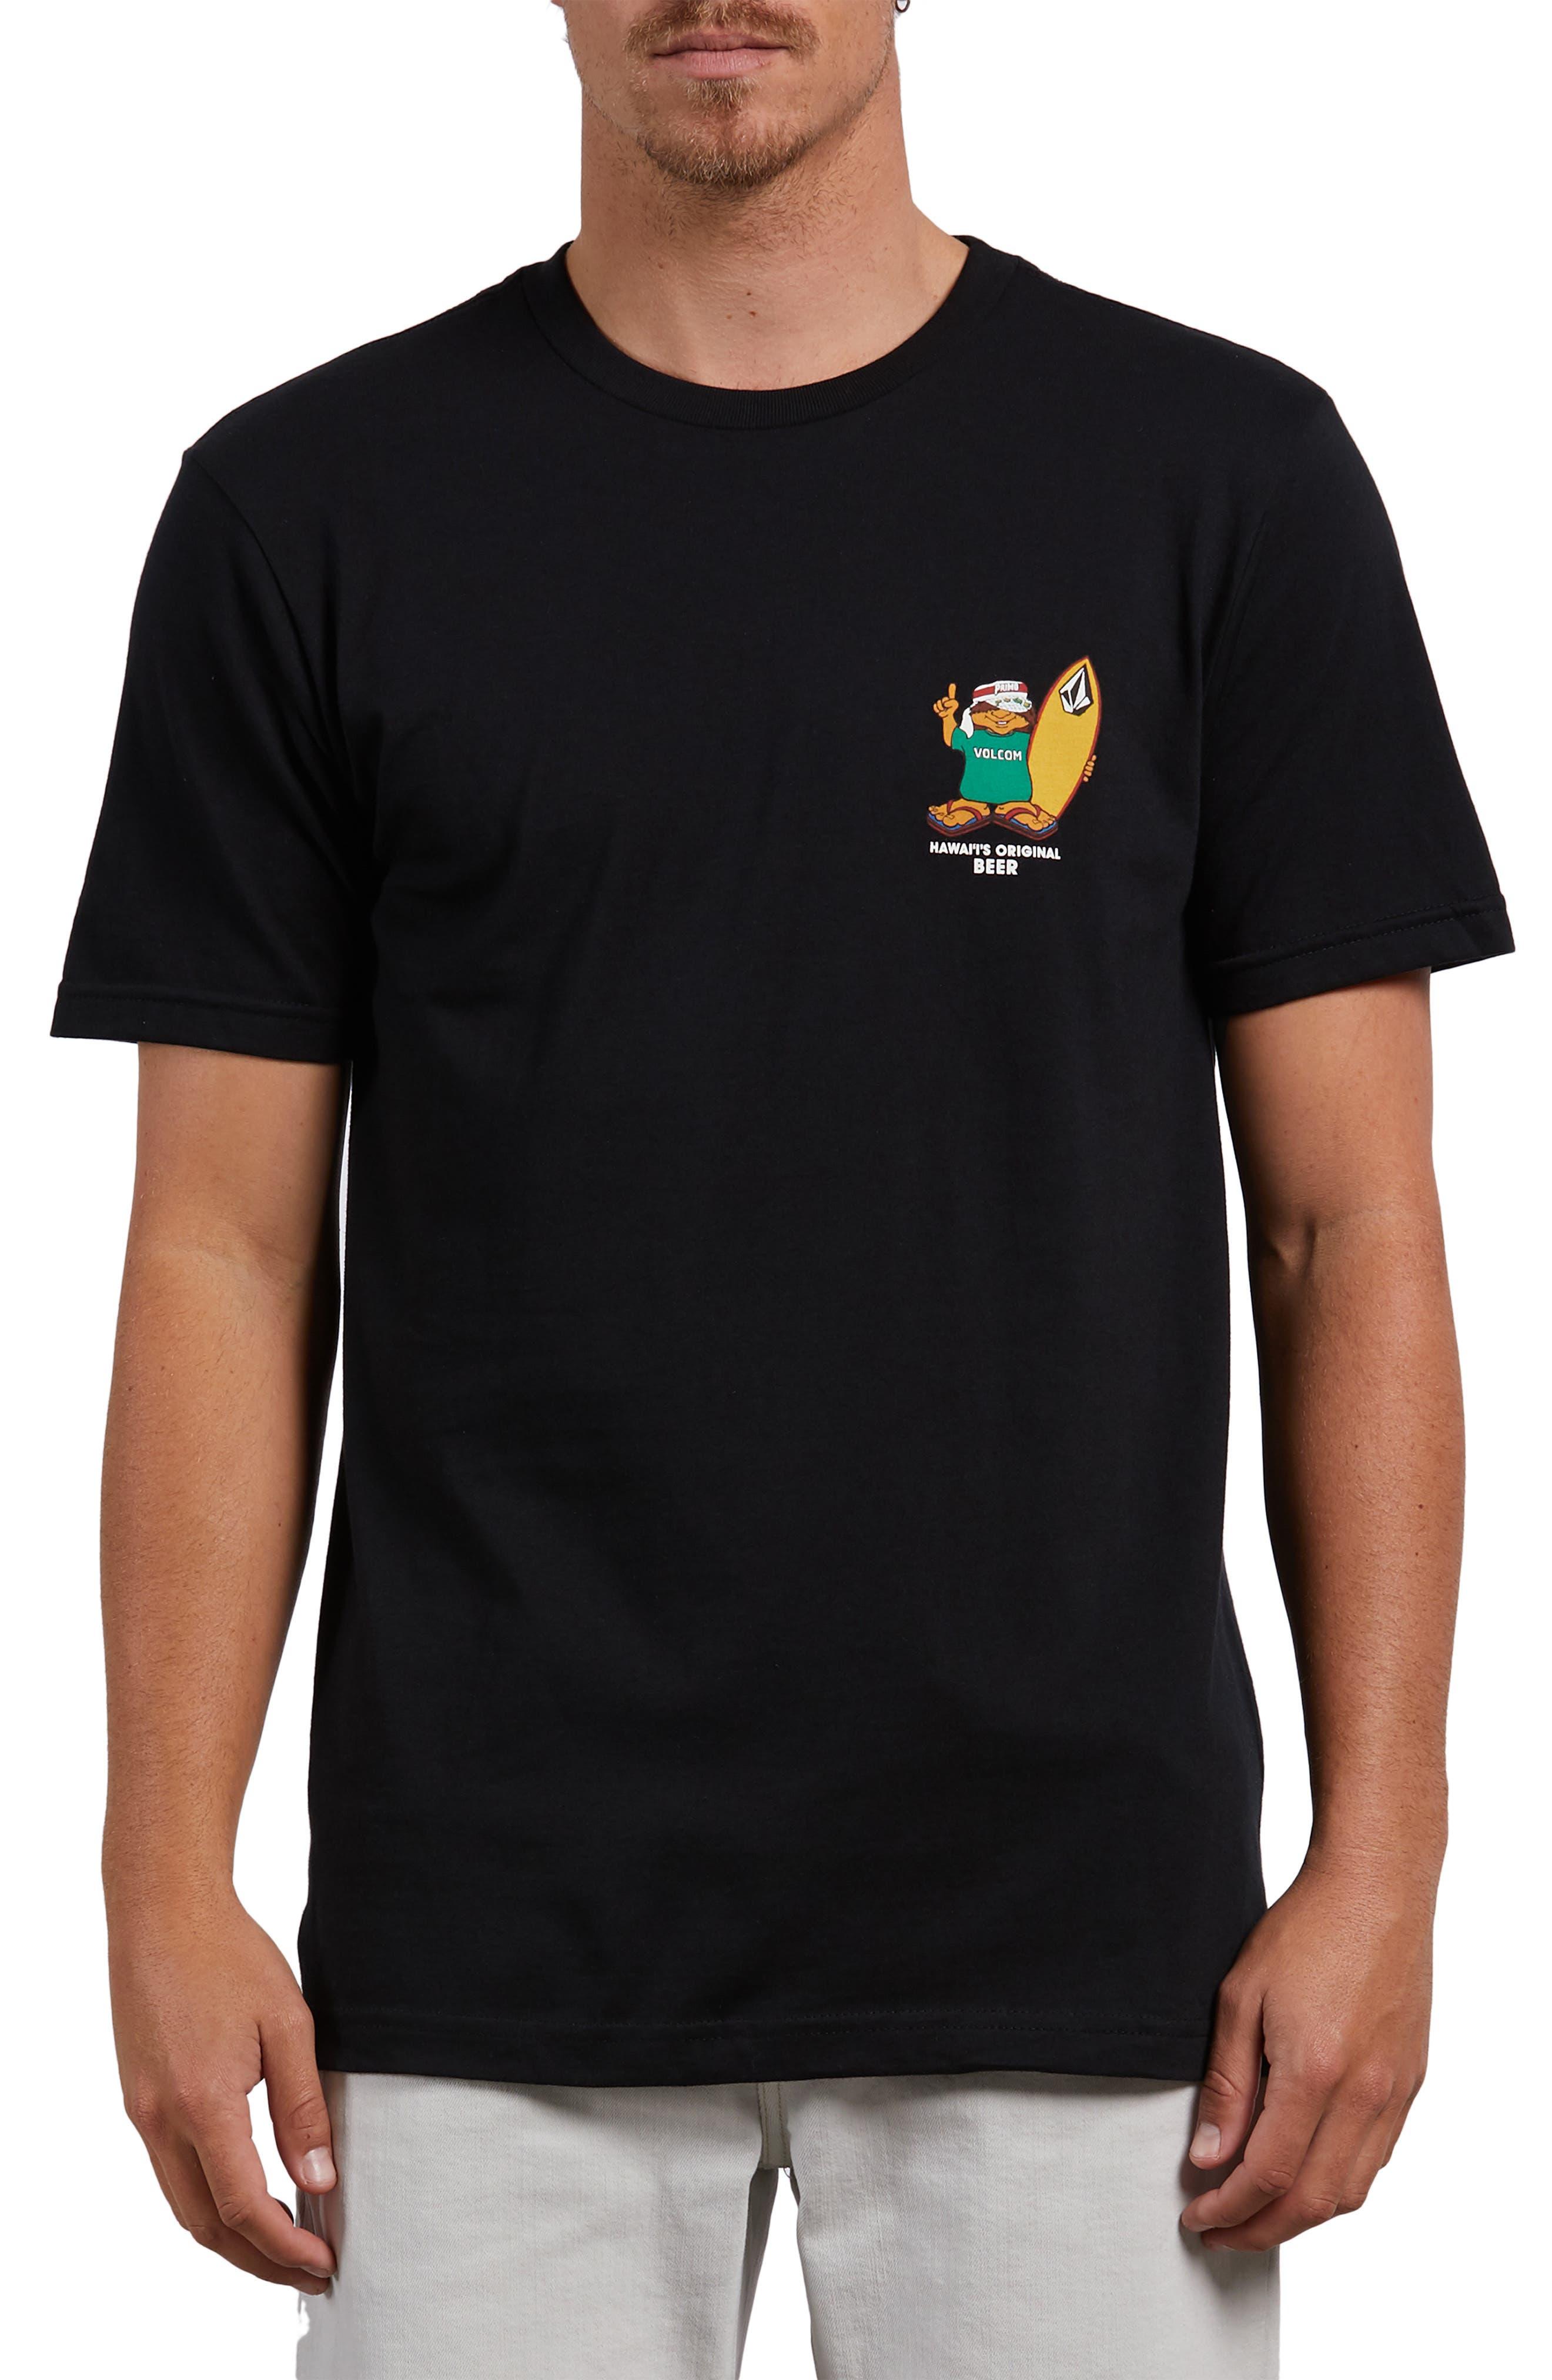 Primo Chance T-Shirt,                             Main thumbnail 1, color,                             BLACK